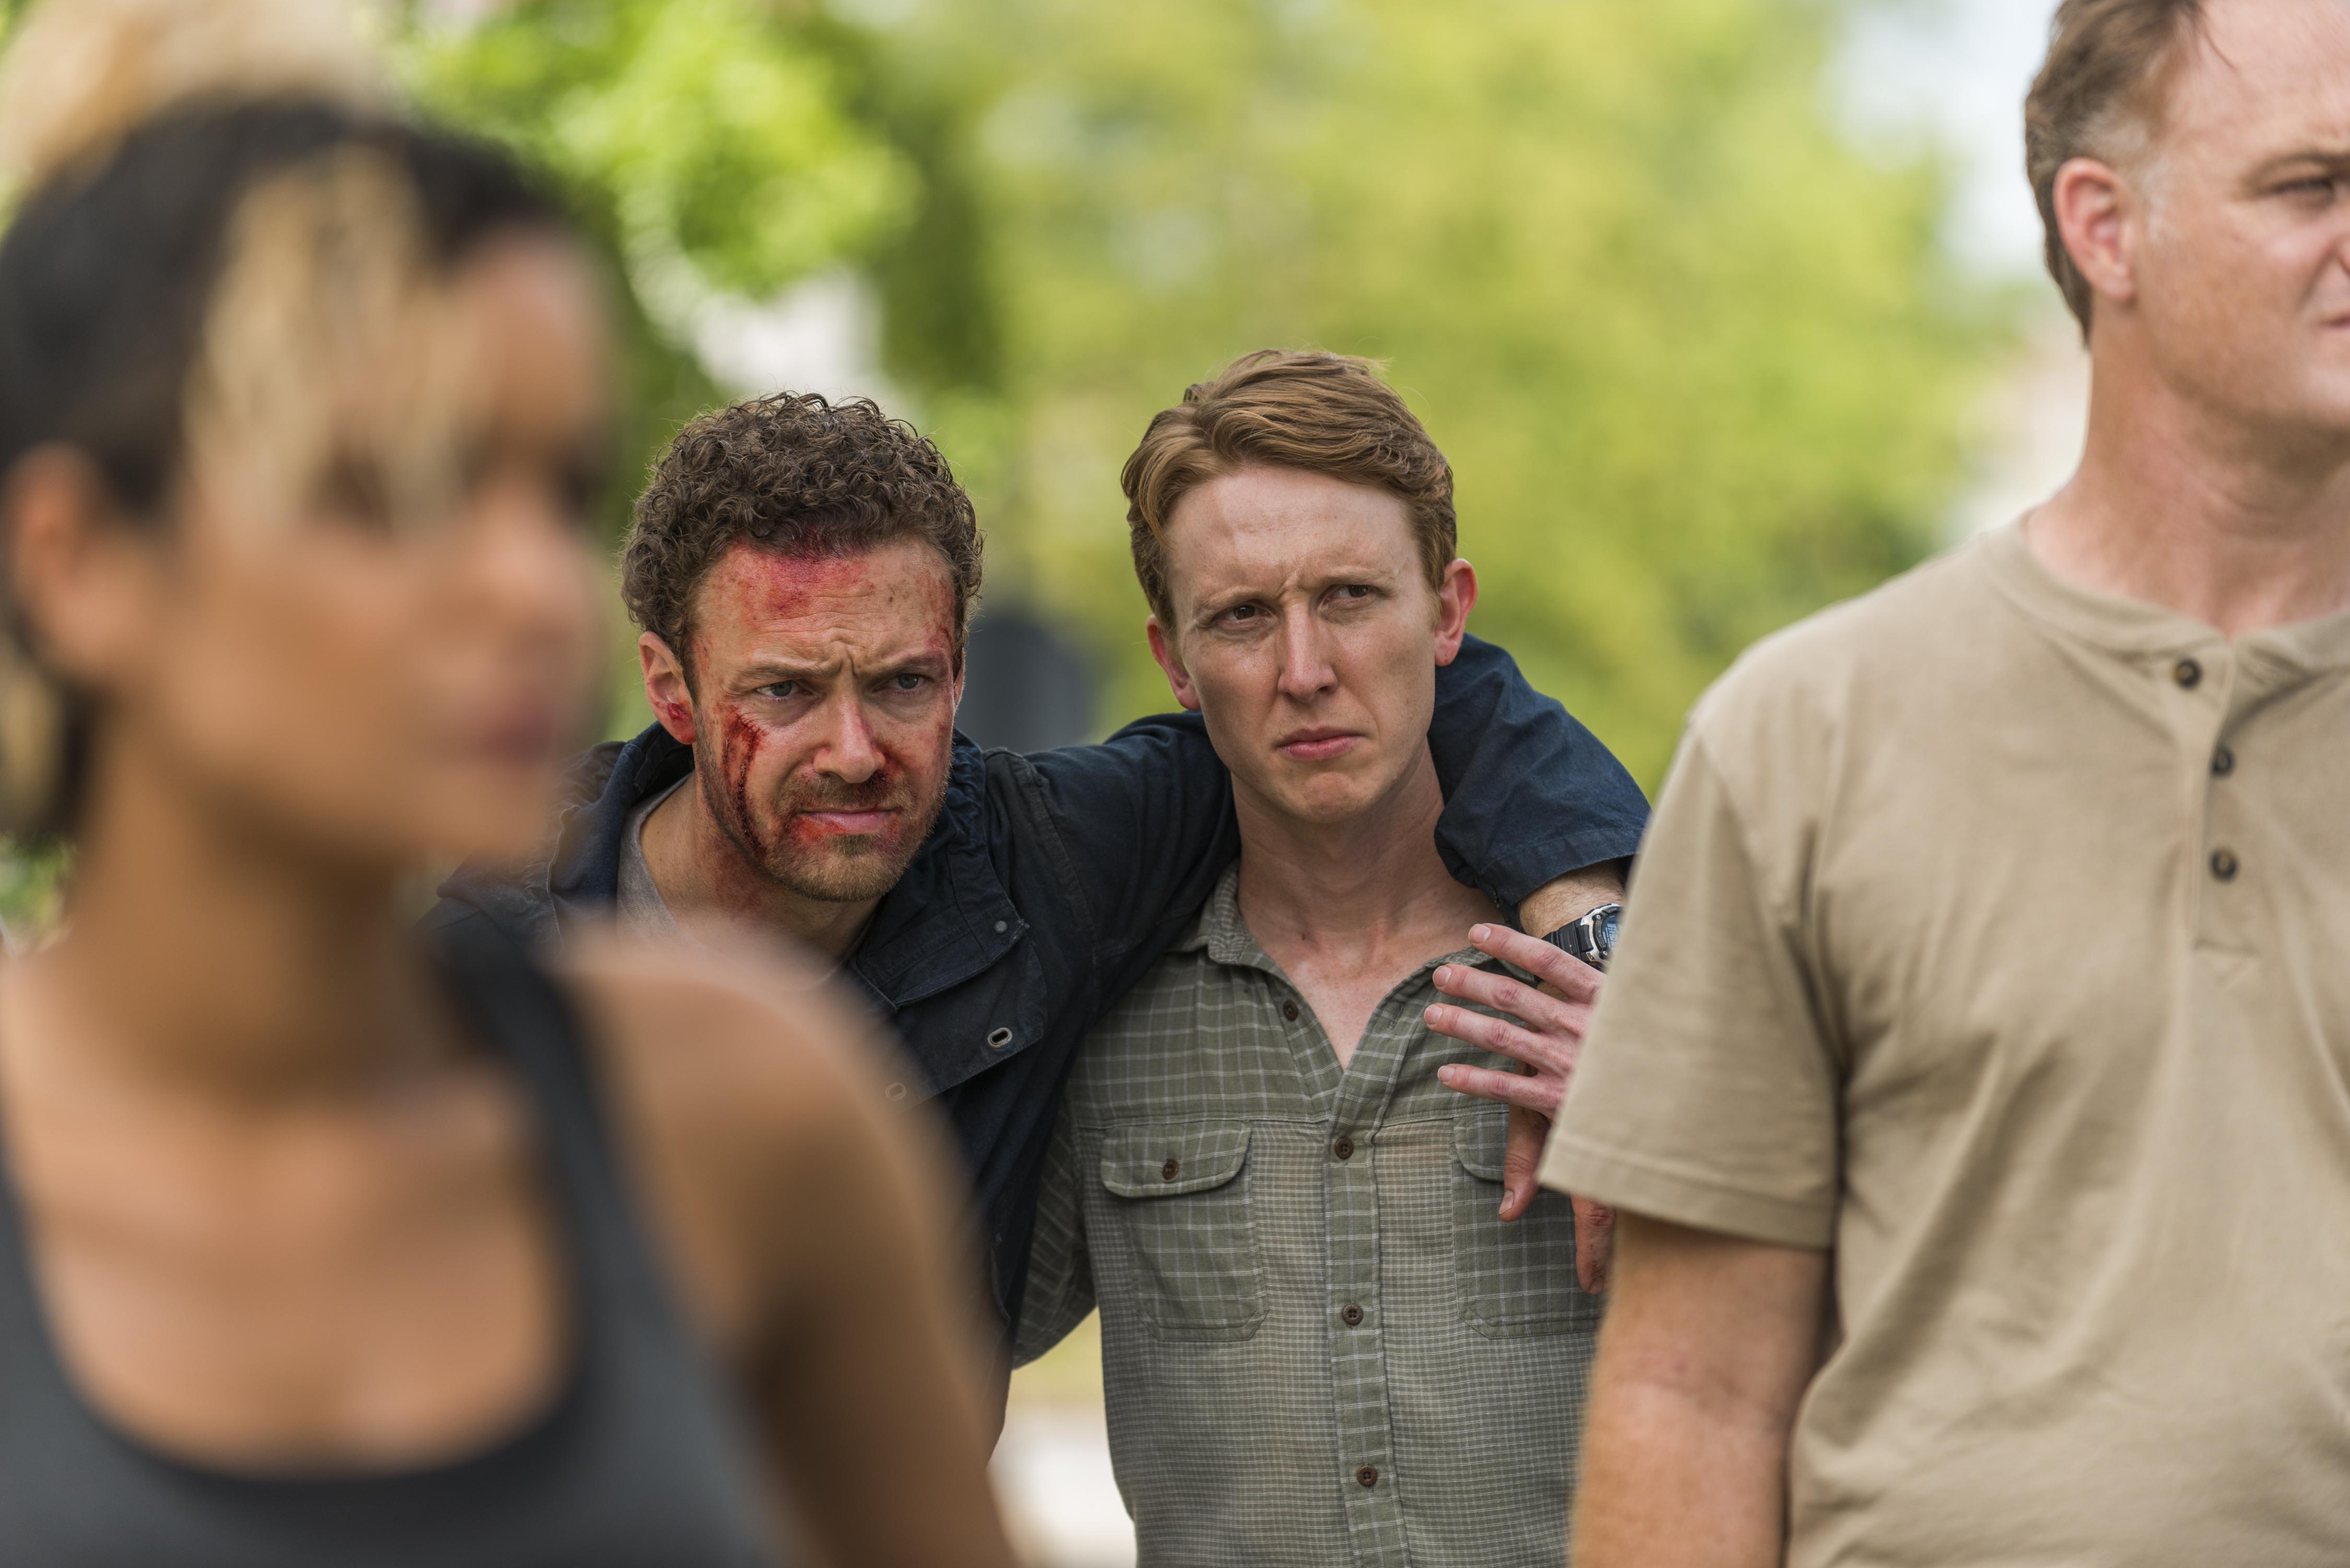 Jason Douglas, Ross Marquand, Jordan Woods-Robinson, and Elizabeth Faith Ludlow in The Walking Dead (2010)